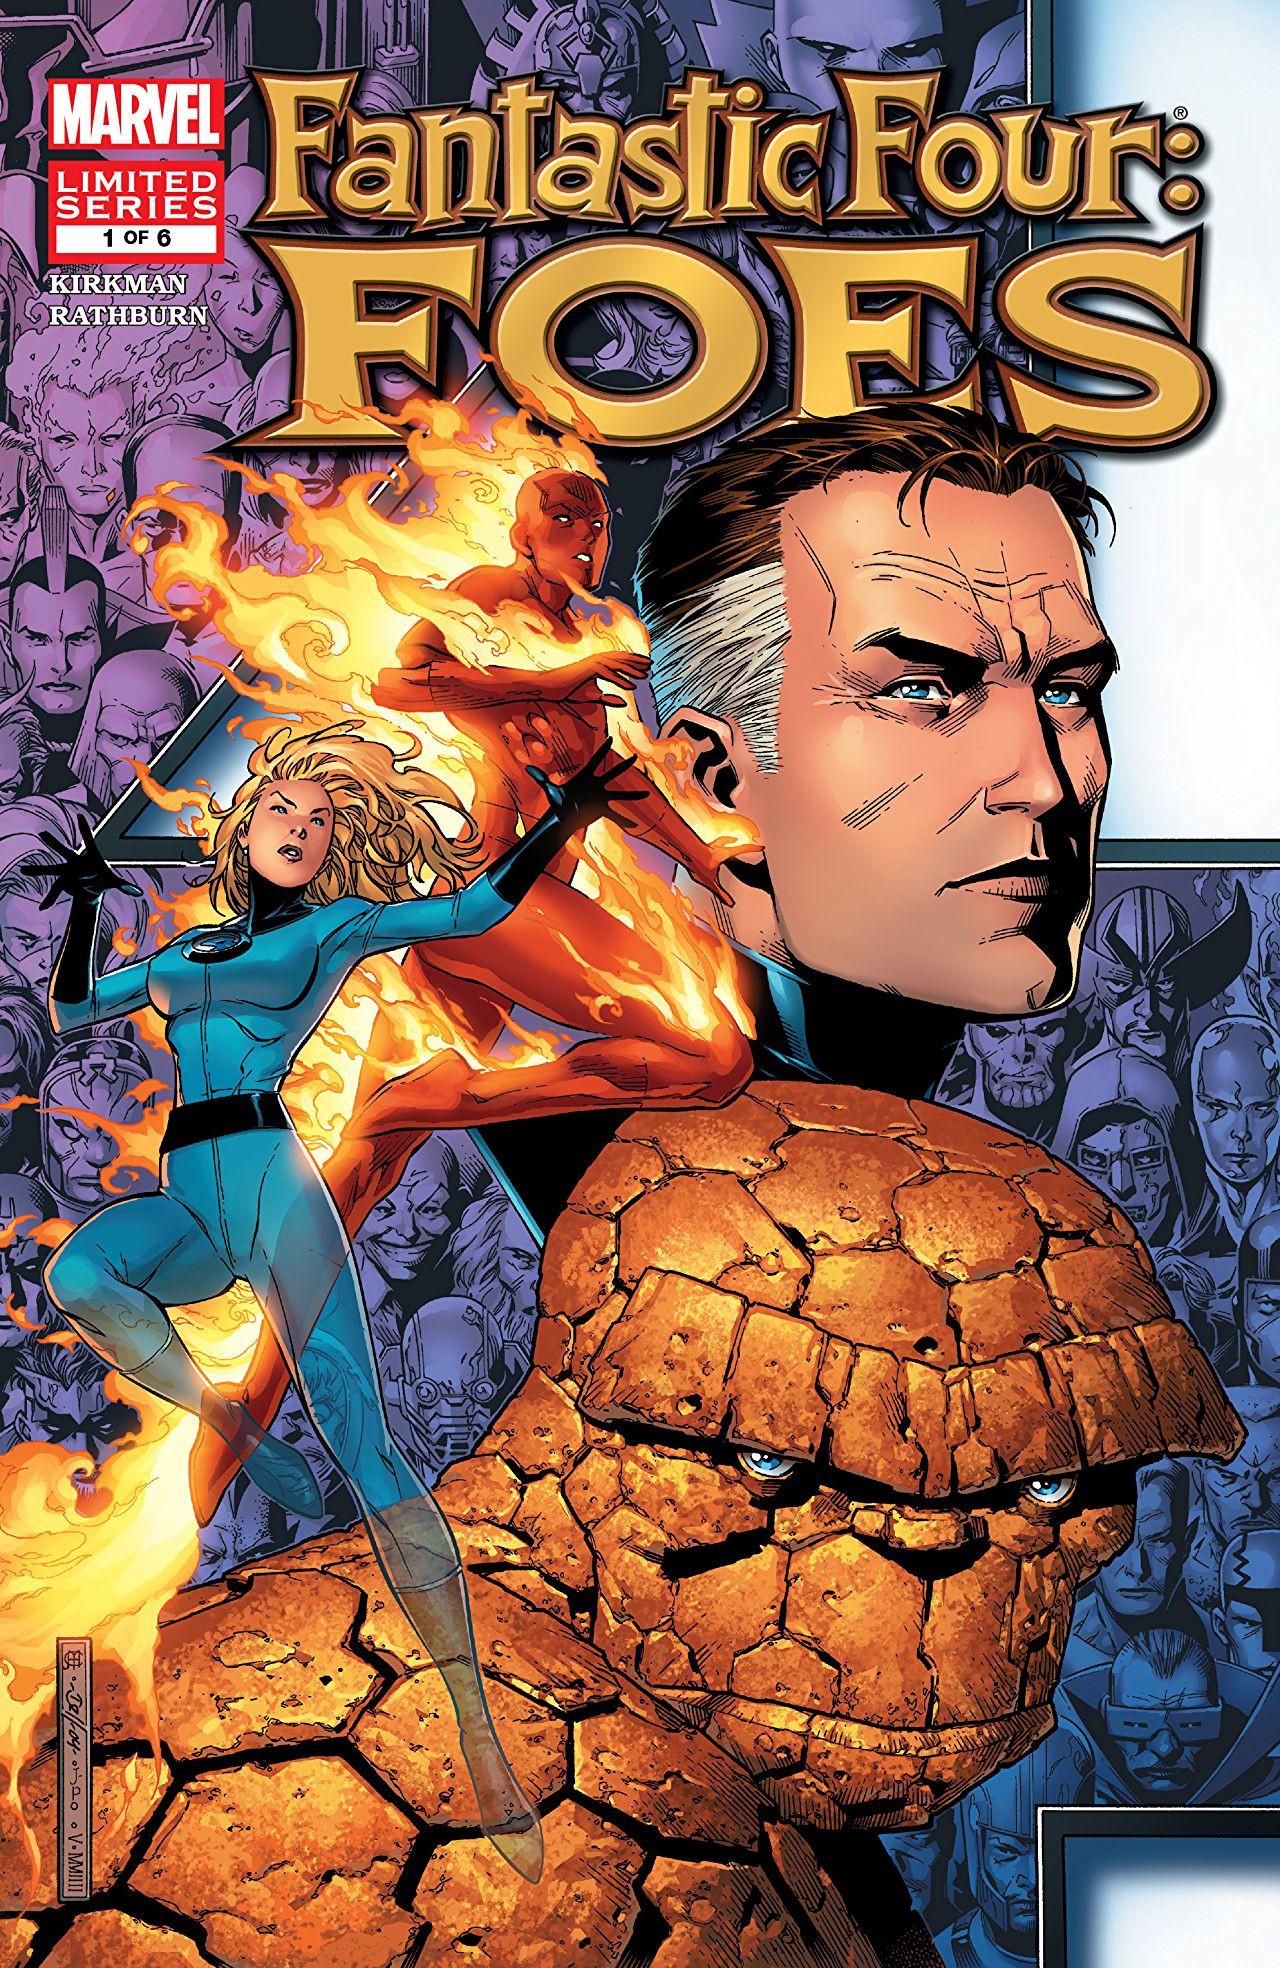 Fantastic Four: Foes Vol 1